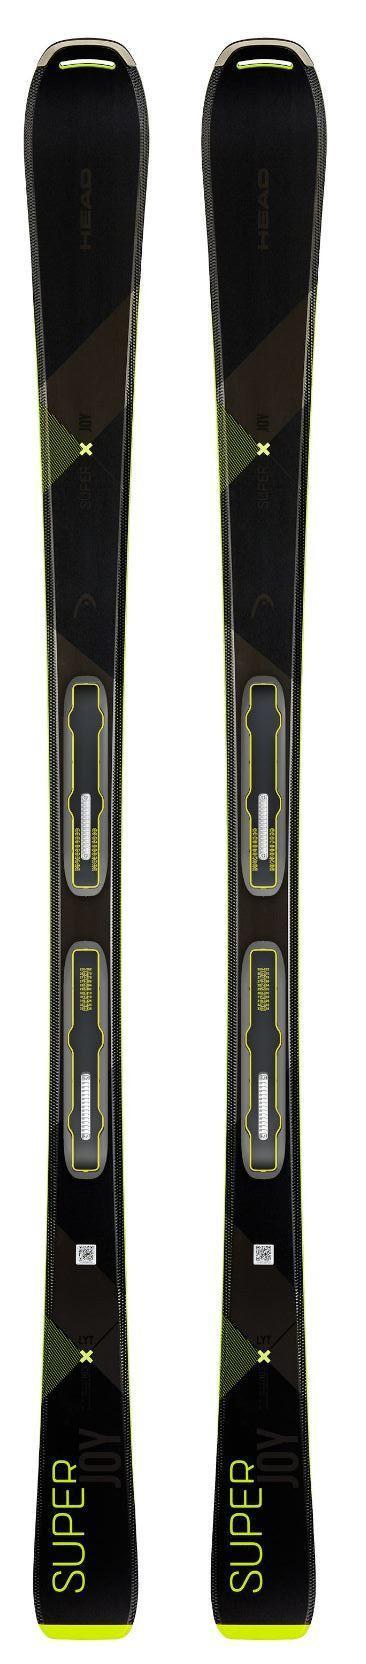 Head Super Joy SLR Wmns Ski + Joy 11 GW Binding